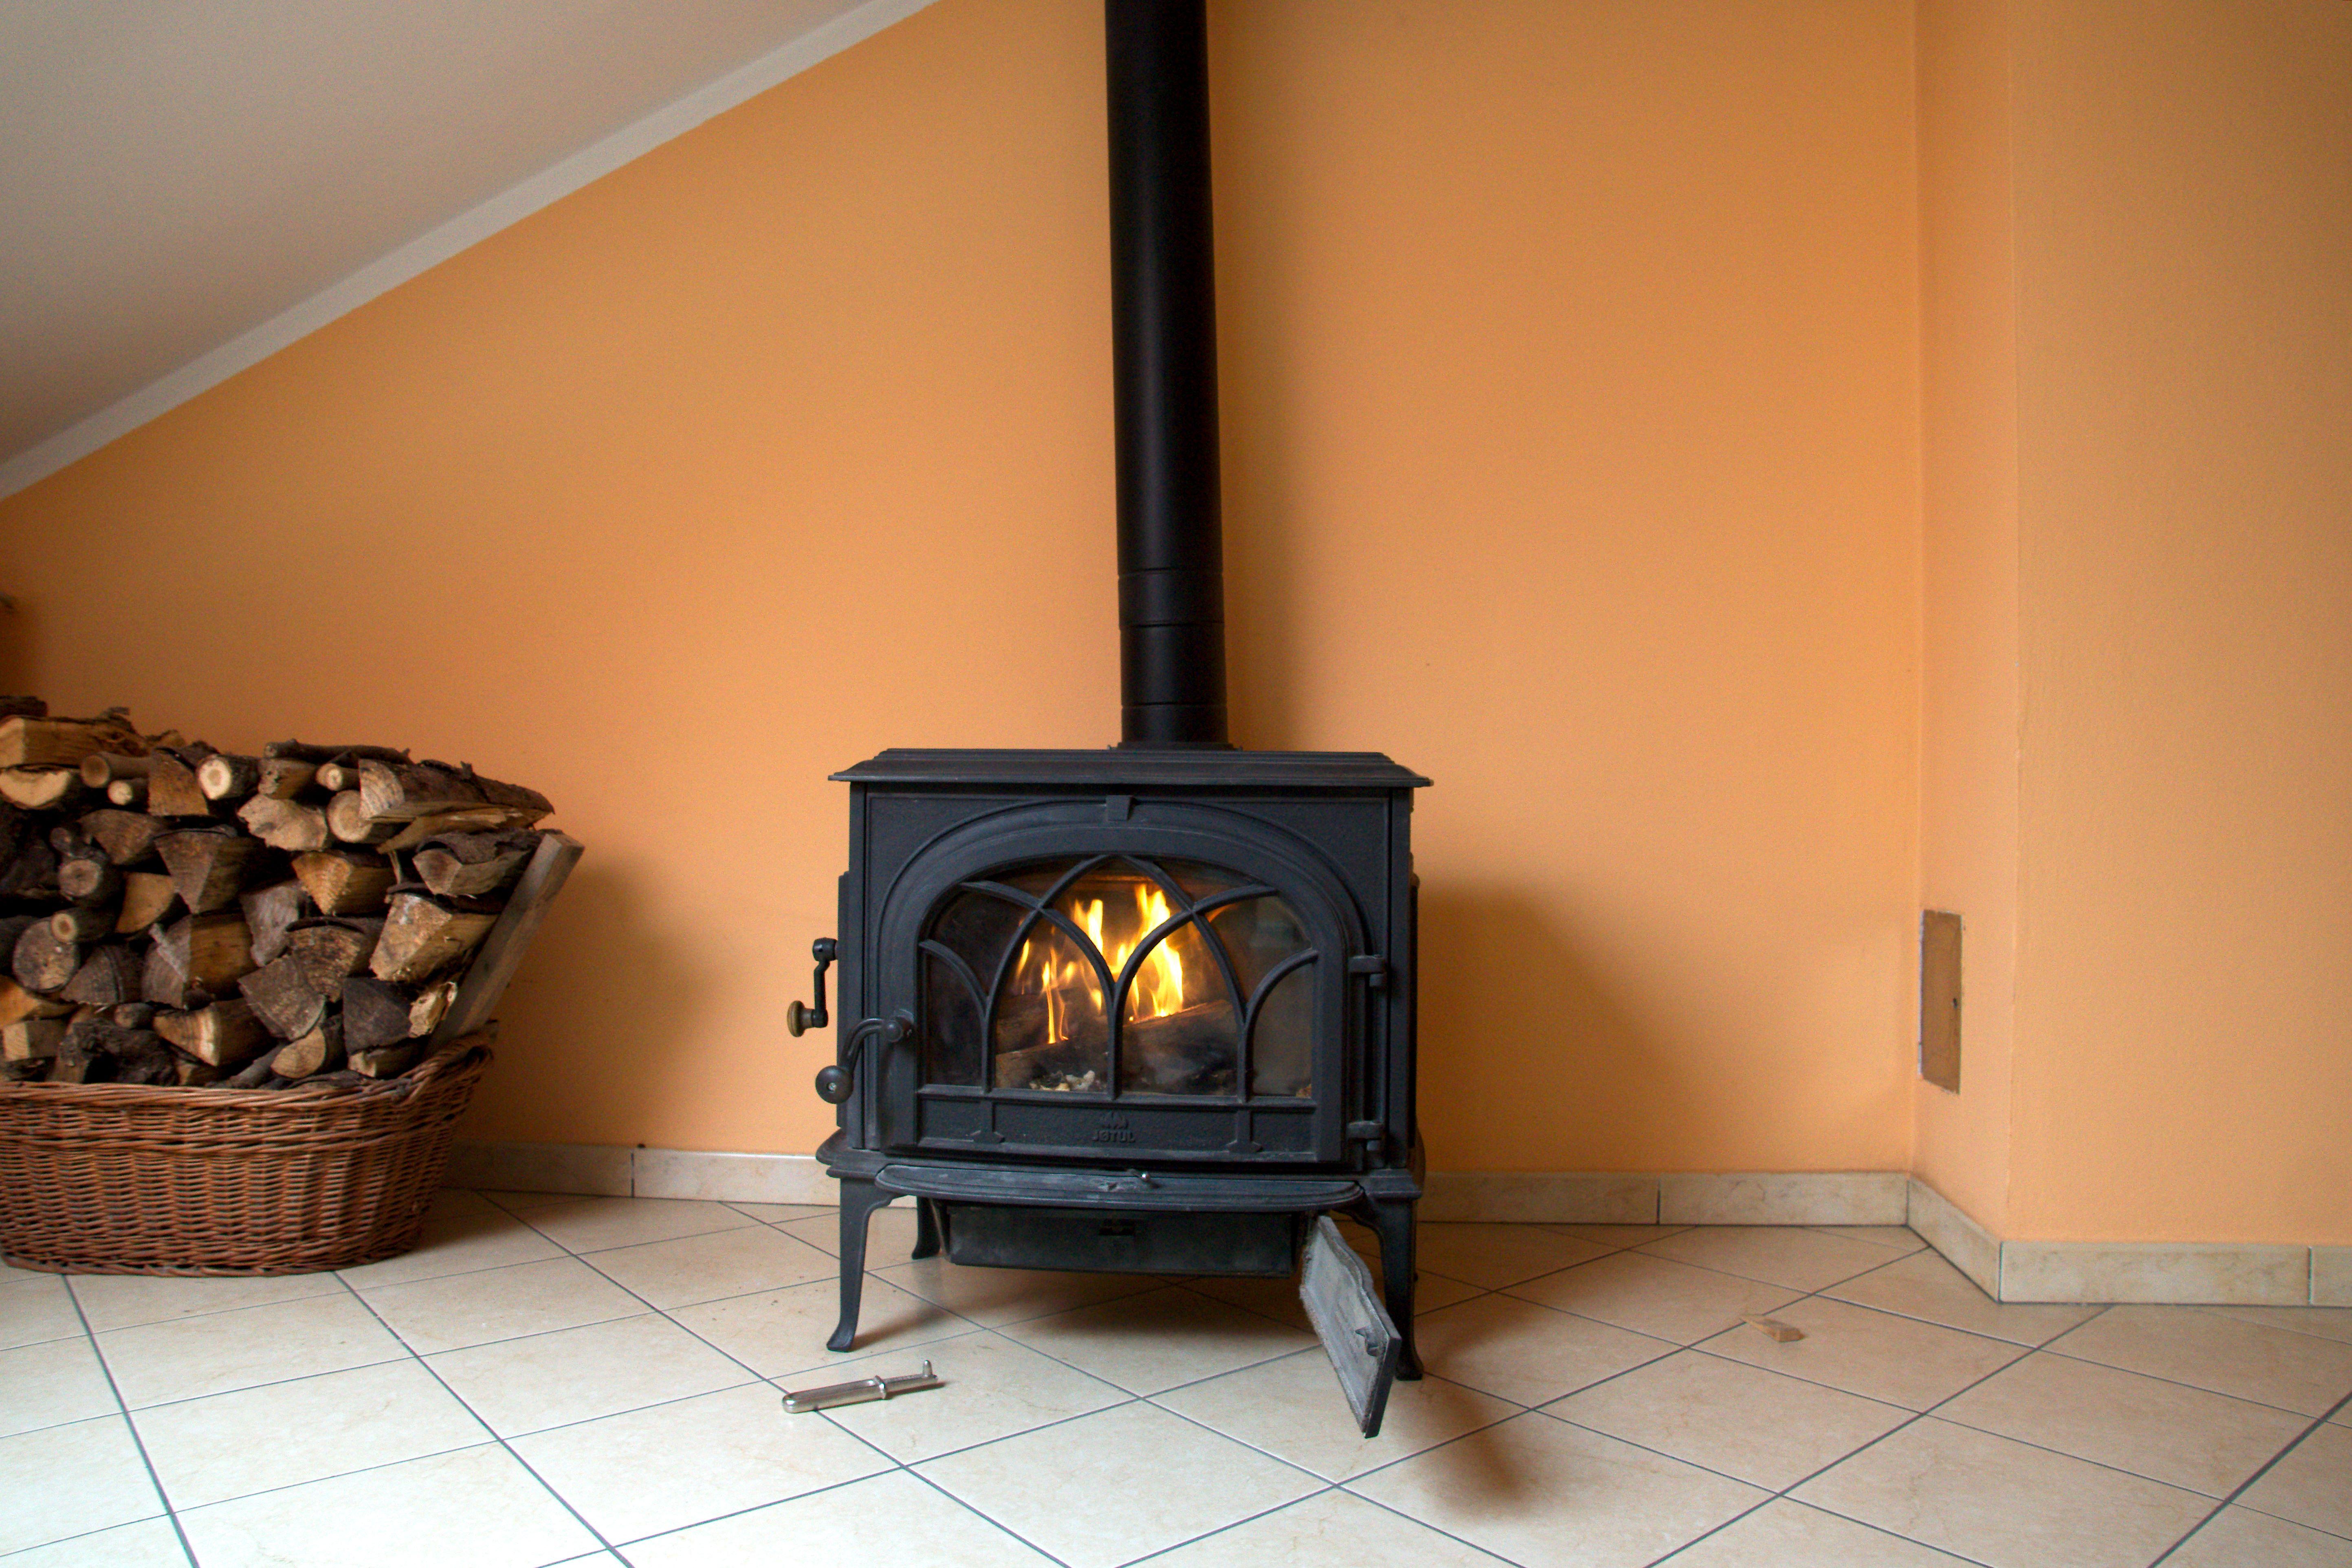 Good_woodburning_stove